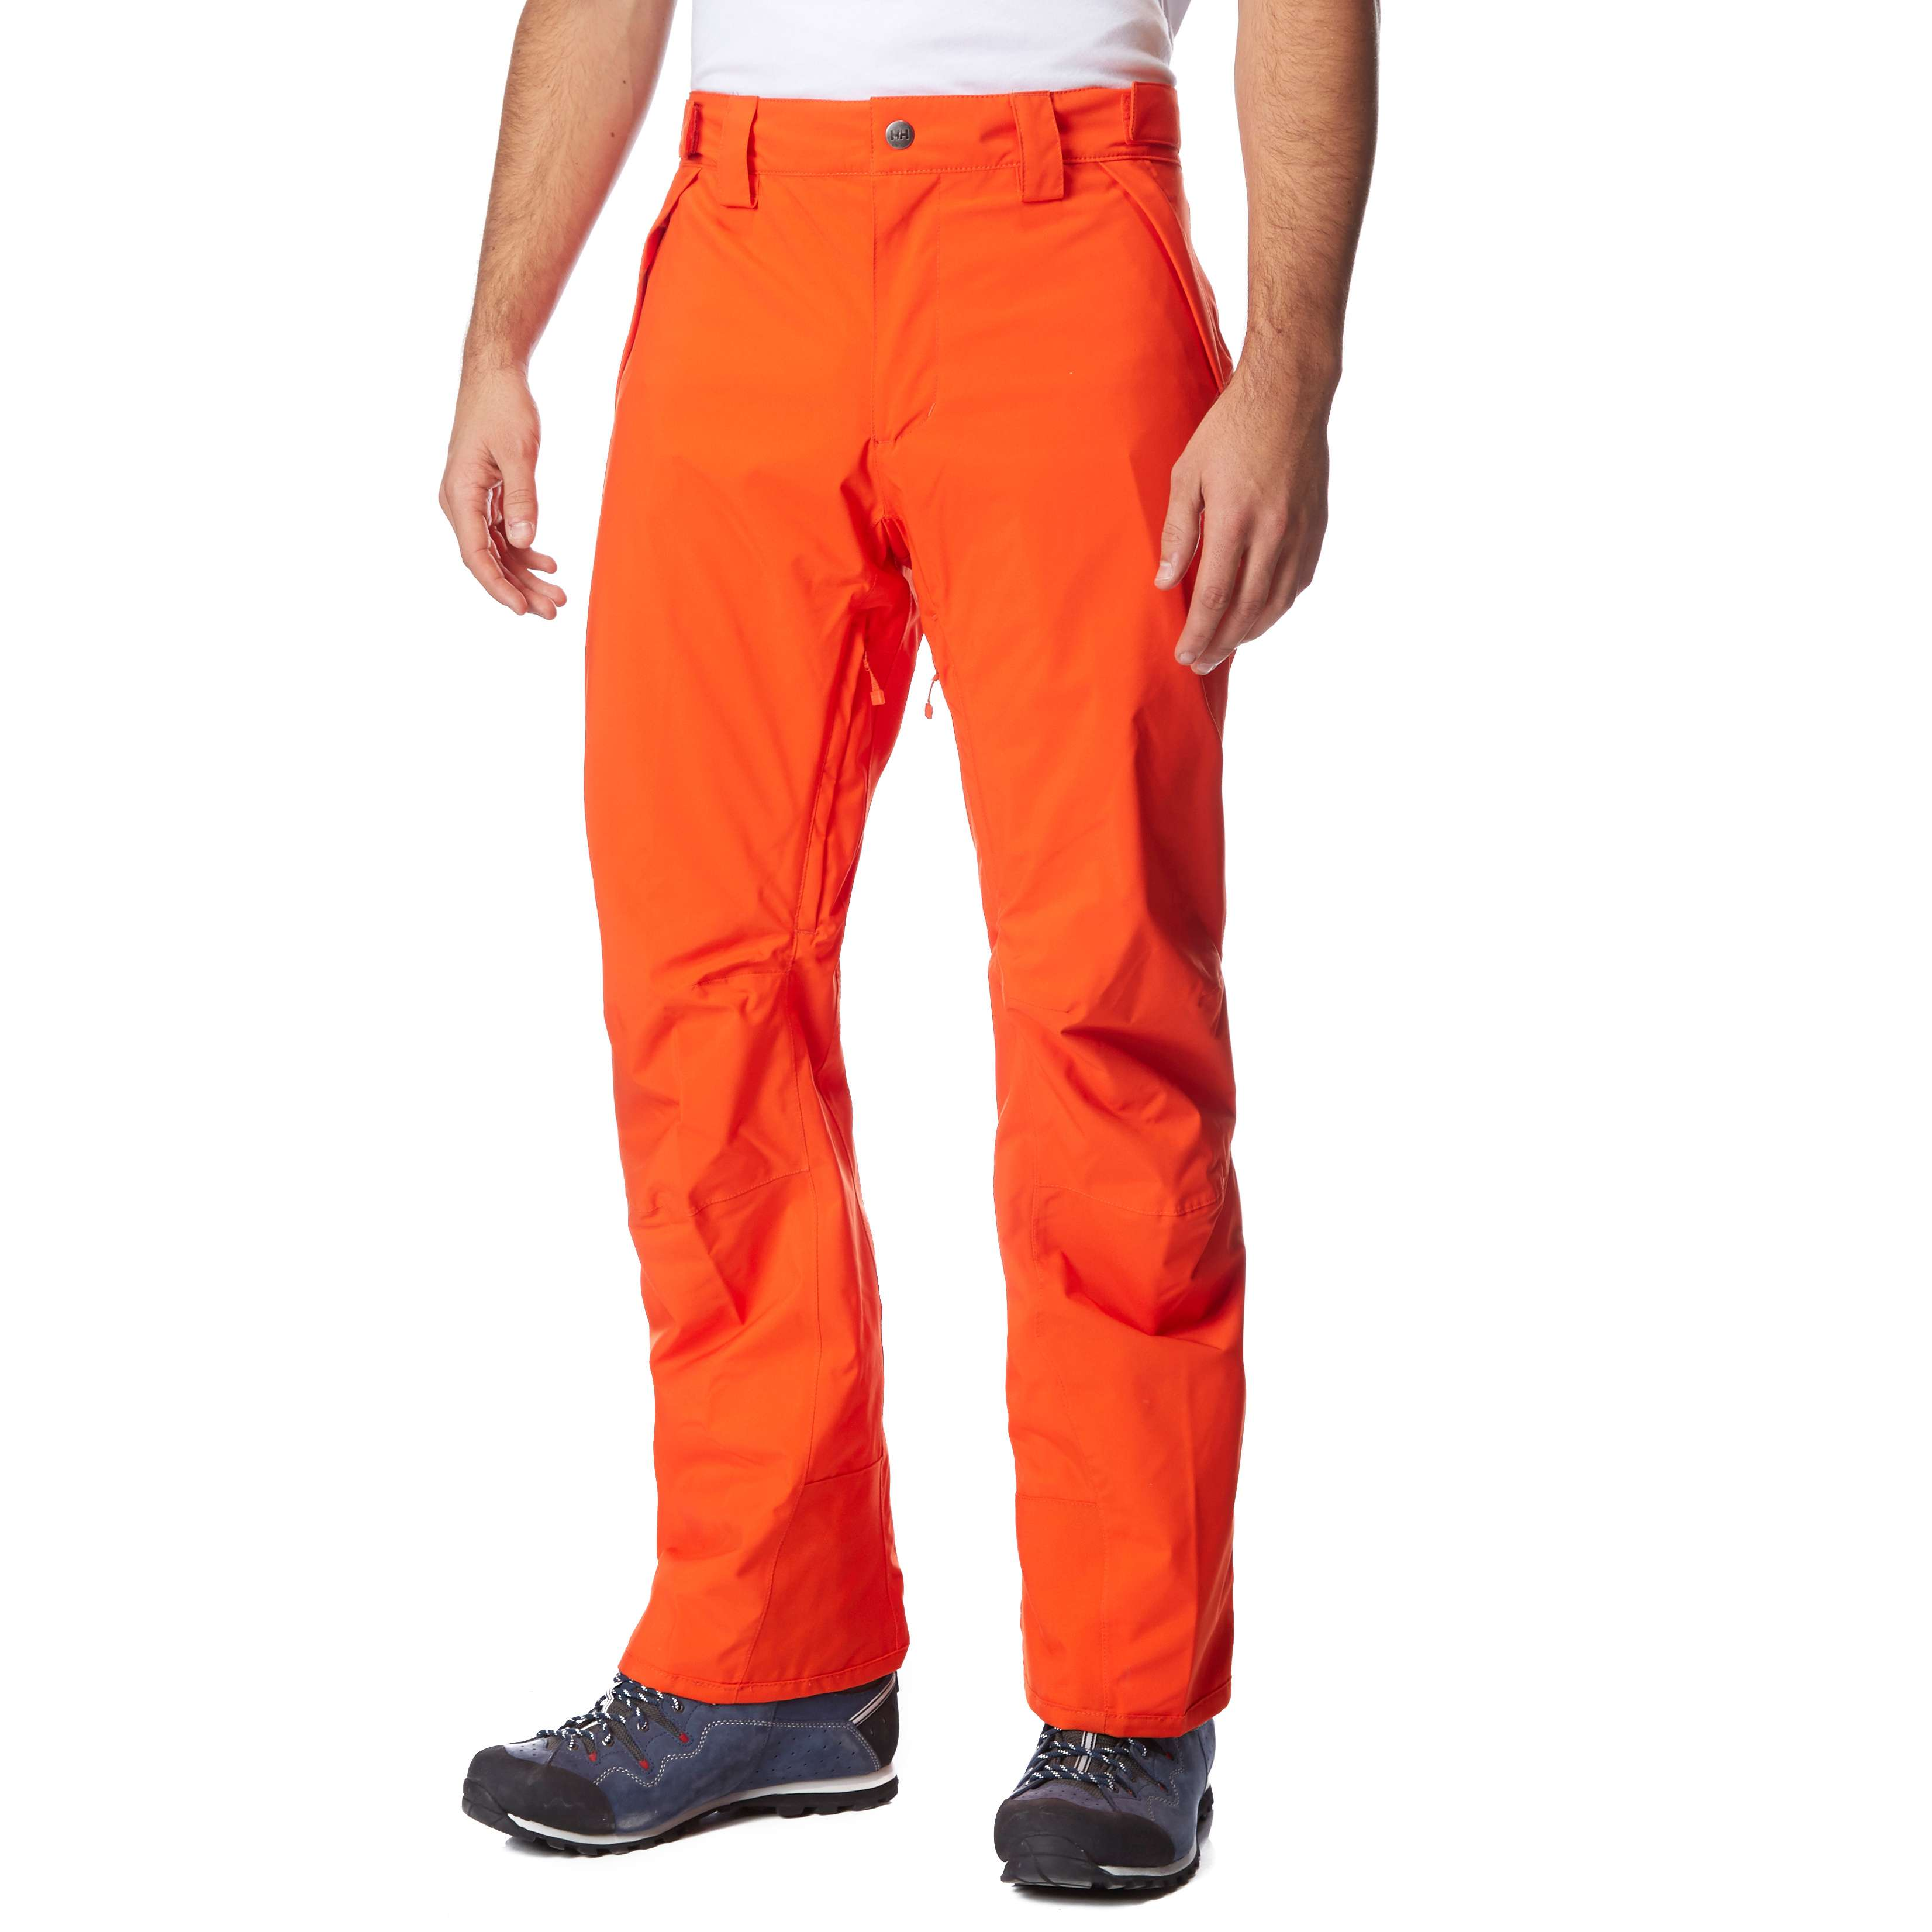 HELLY HANSEN Men's Velocity Insulated Ski Pants